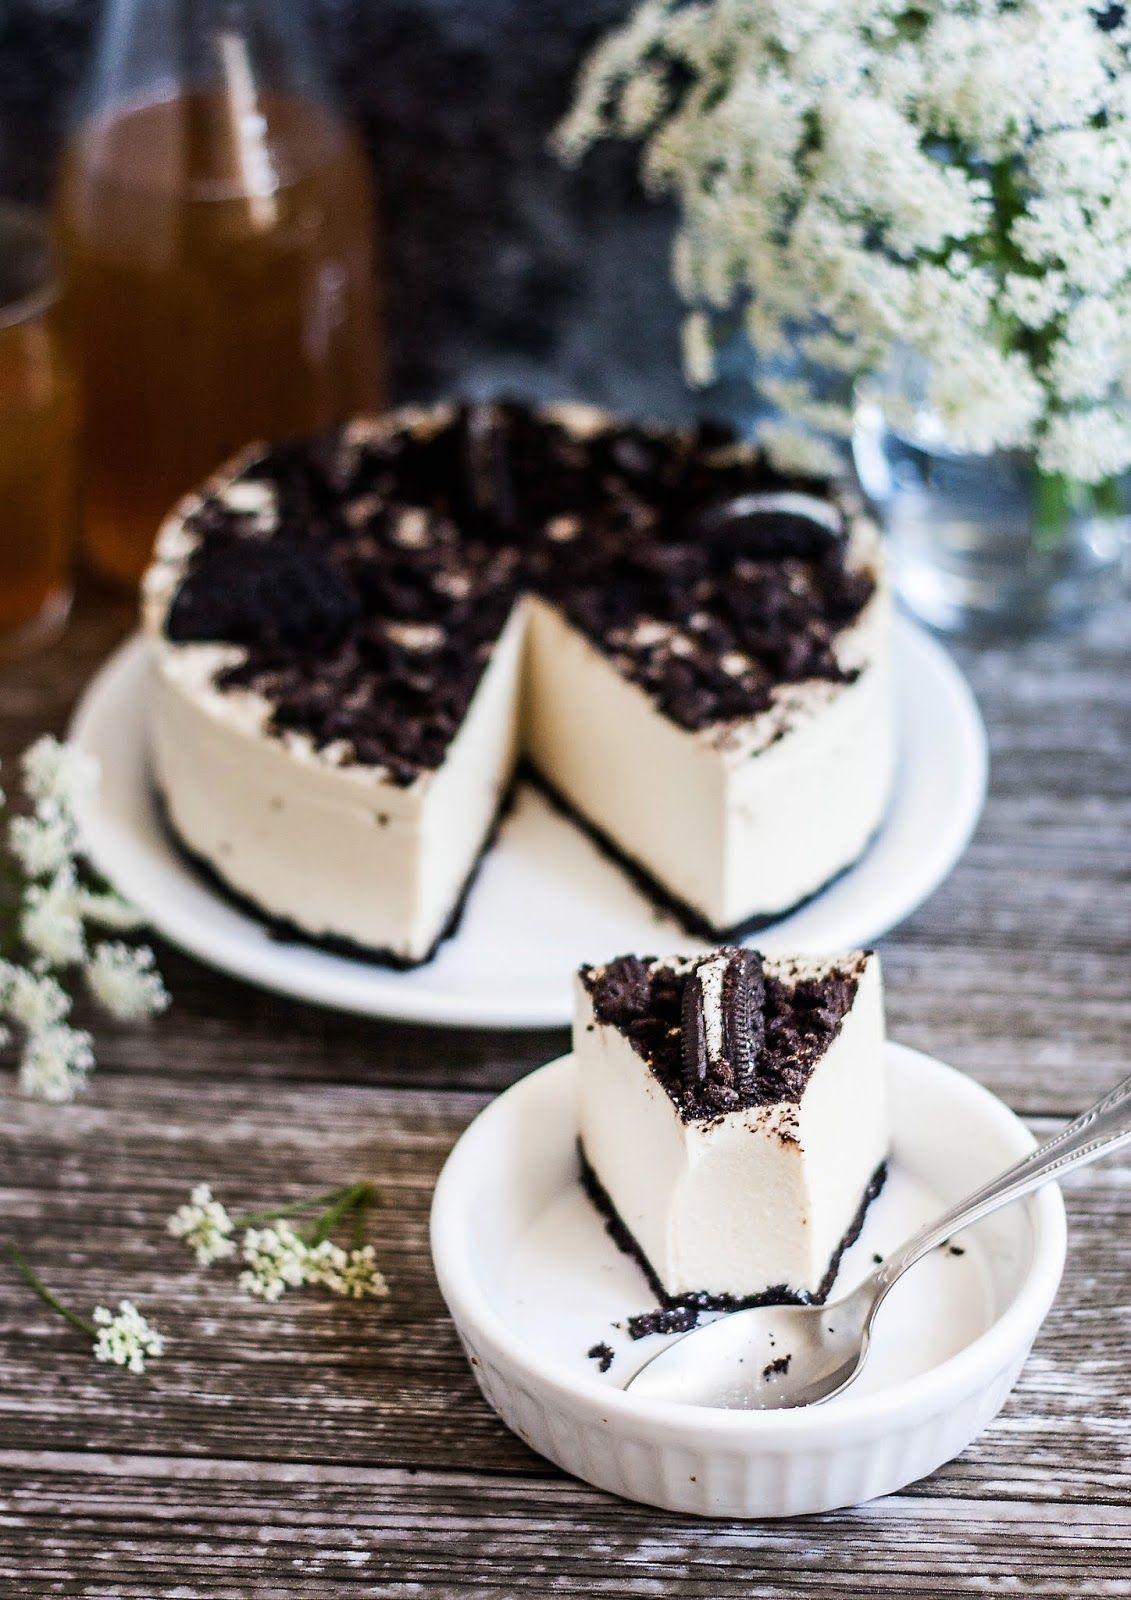 Mniumniu Kuchnia Roslinna Tofurnik Na Zimno Z Oreo Desserts Baking Vegan Sweets